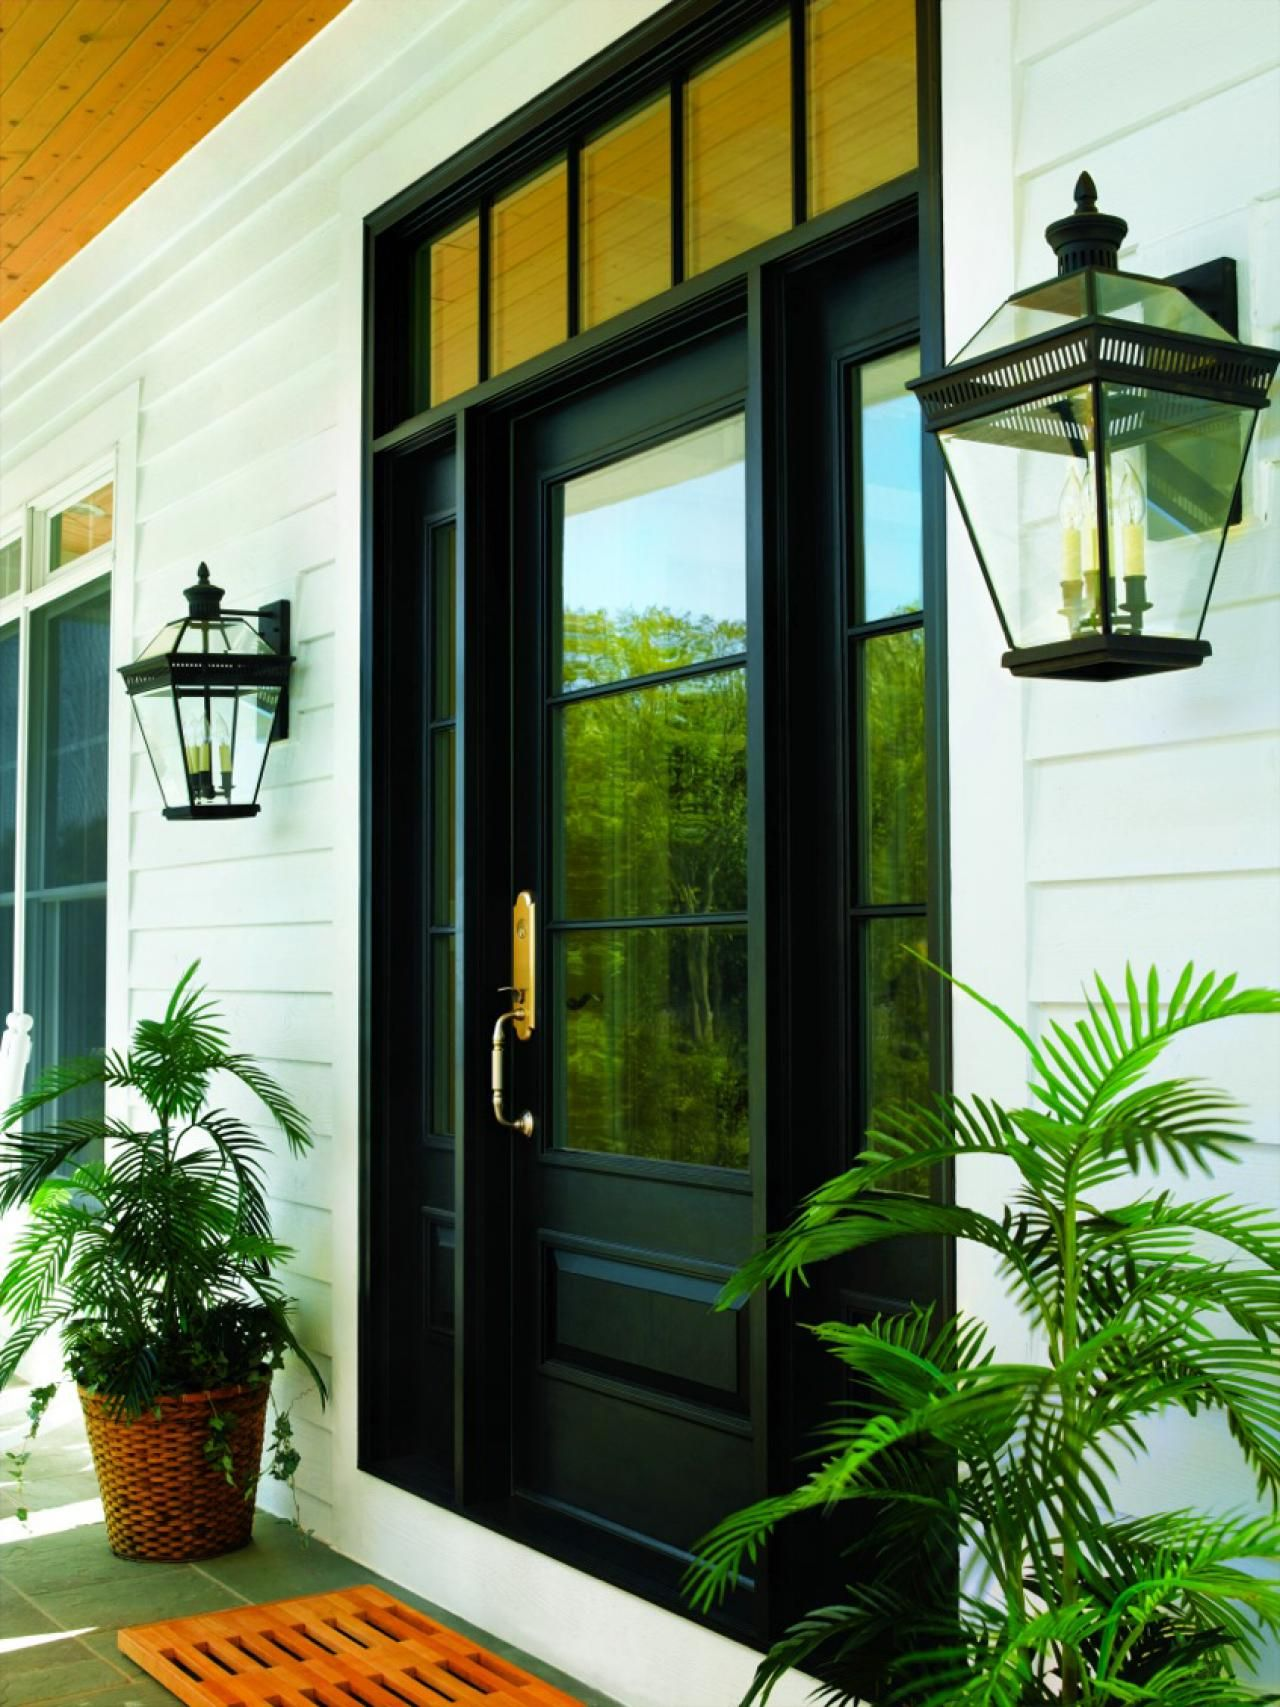 20 Stunning Entryways and Front Door Designs | Hgtv, Front ...